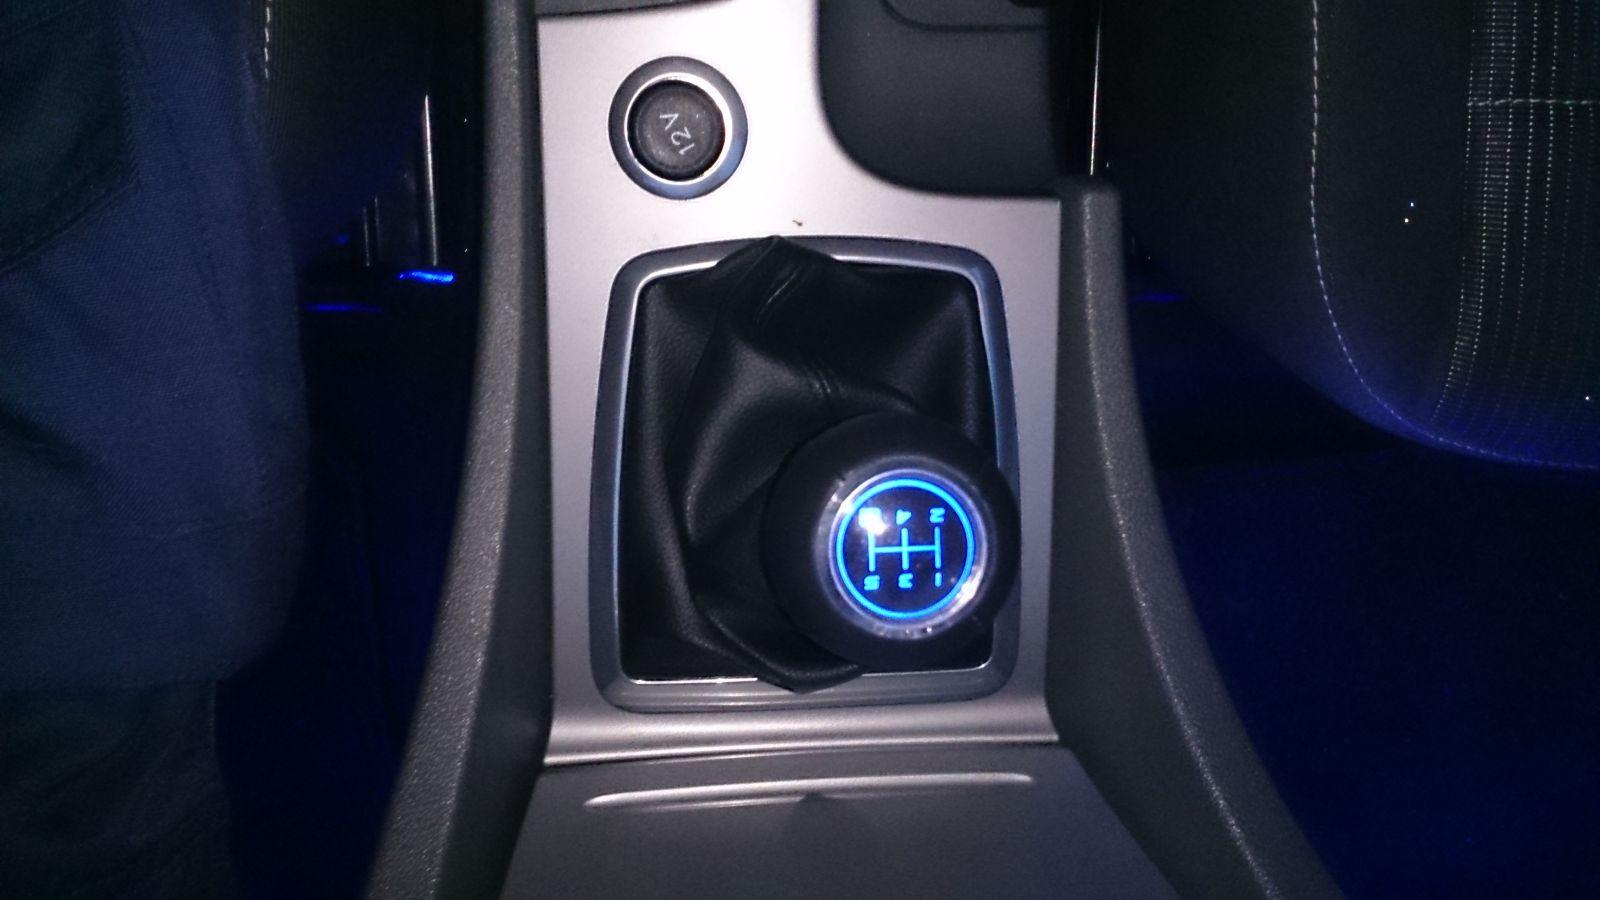 new led gear knob